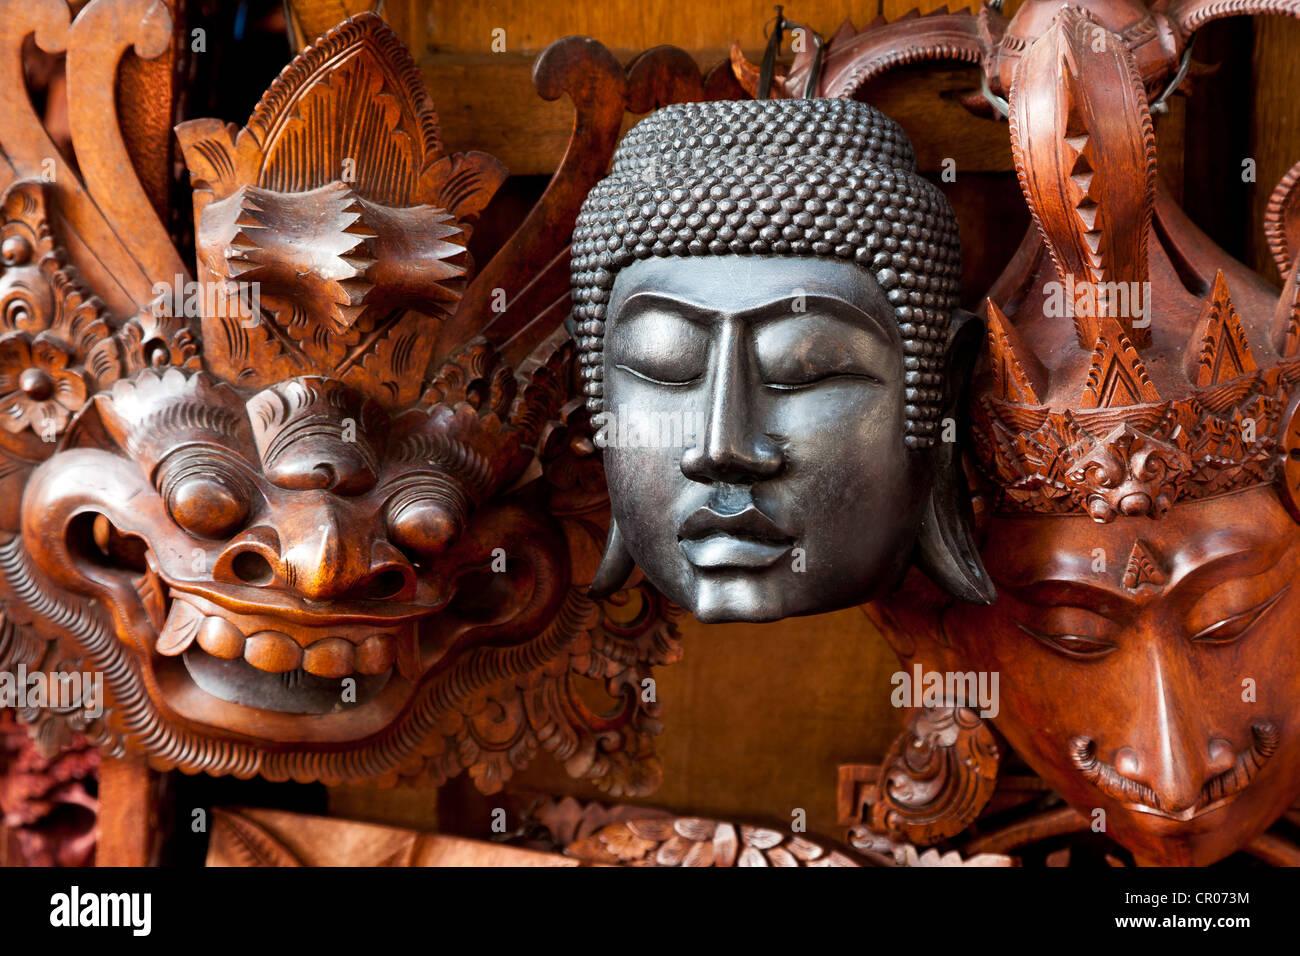 Buddhist and Hindu masks, Ubud, central Bali, Indonesia, Southeast Asia Stock Photo